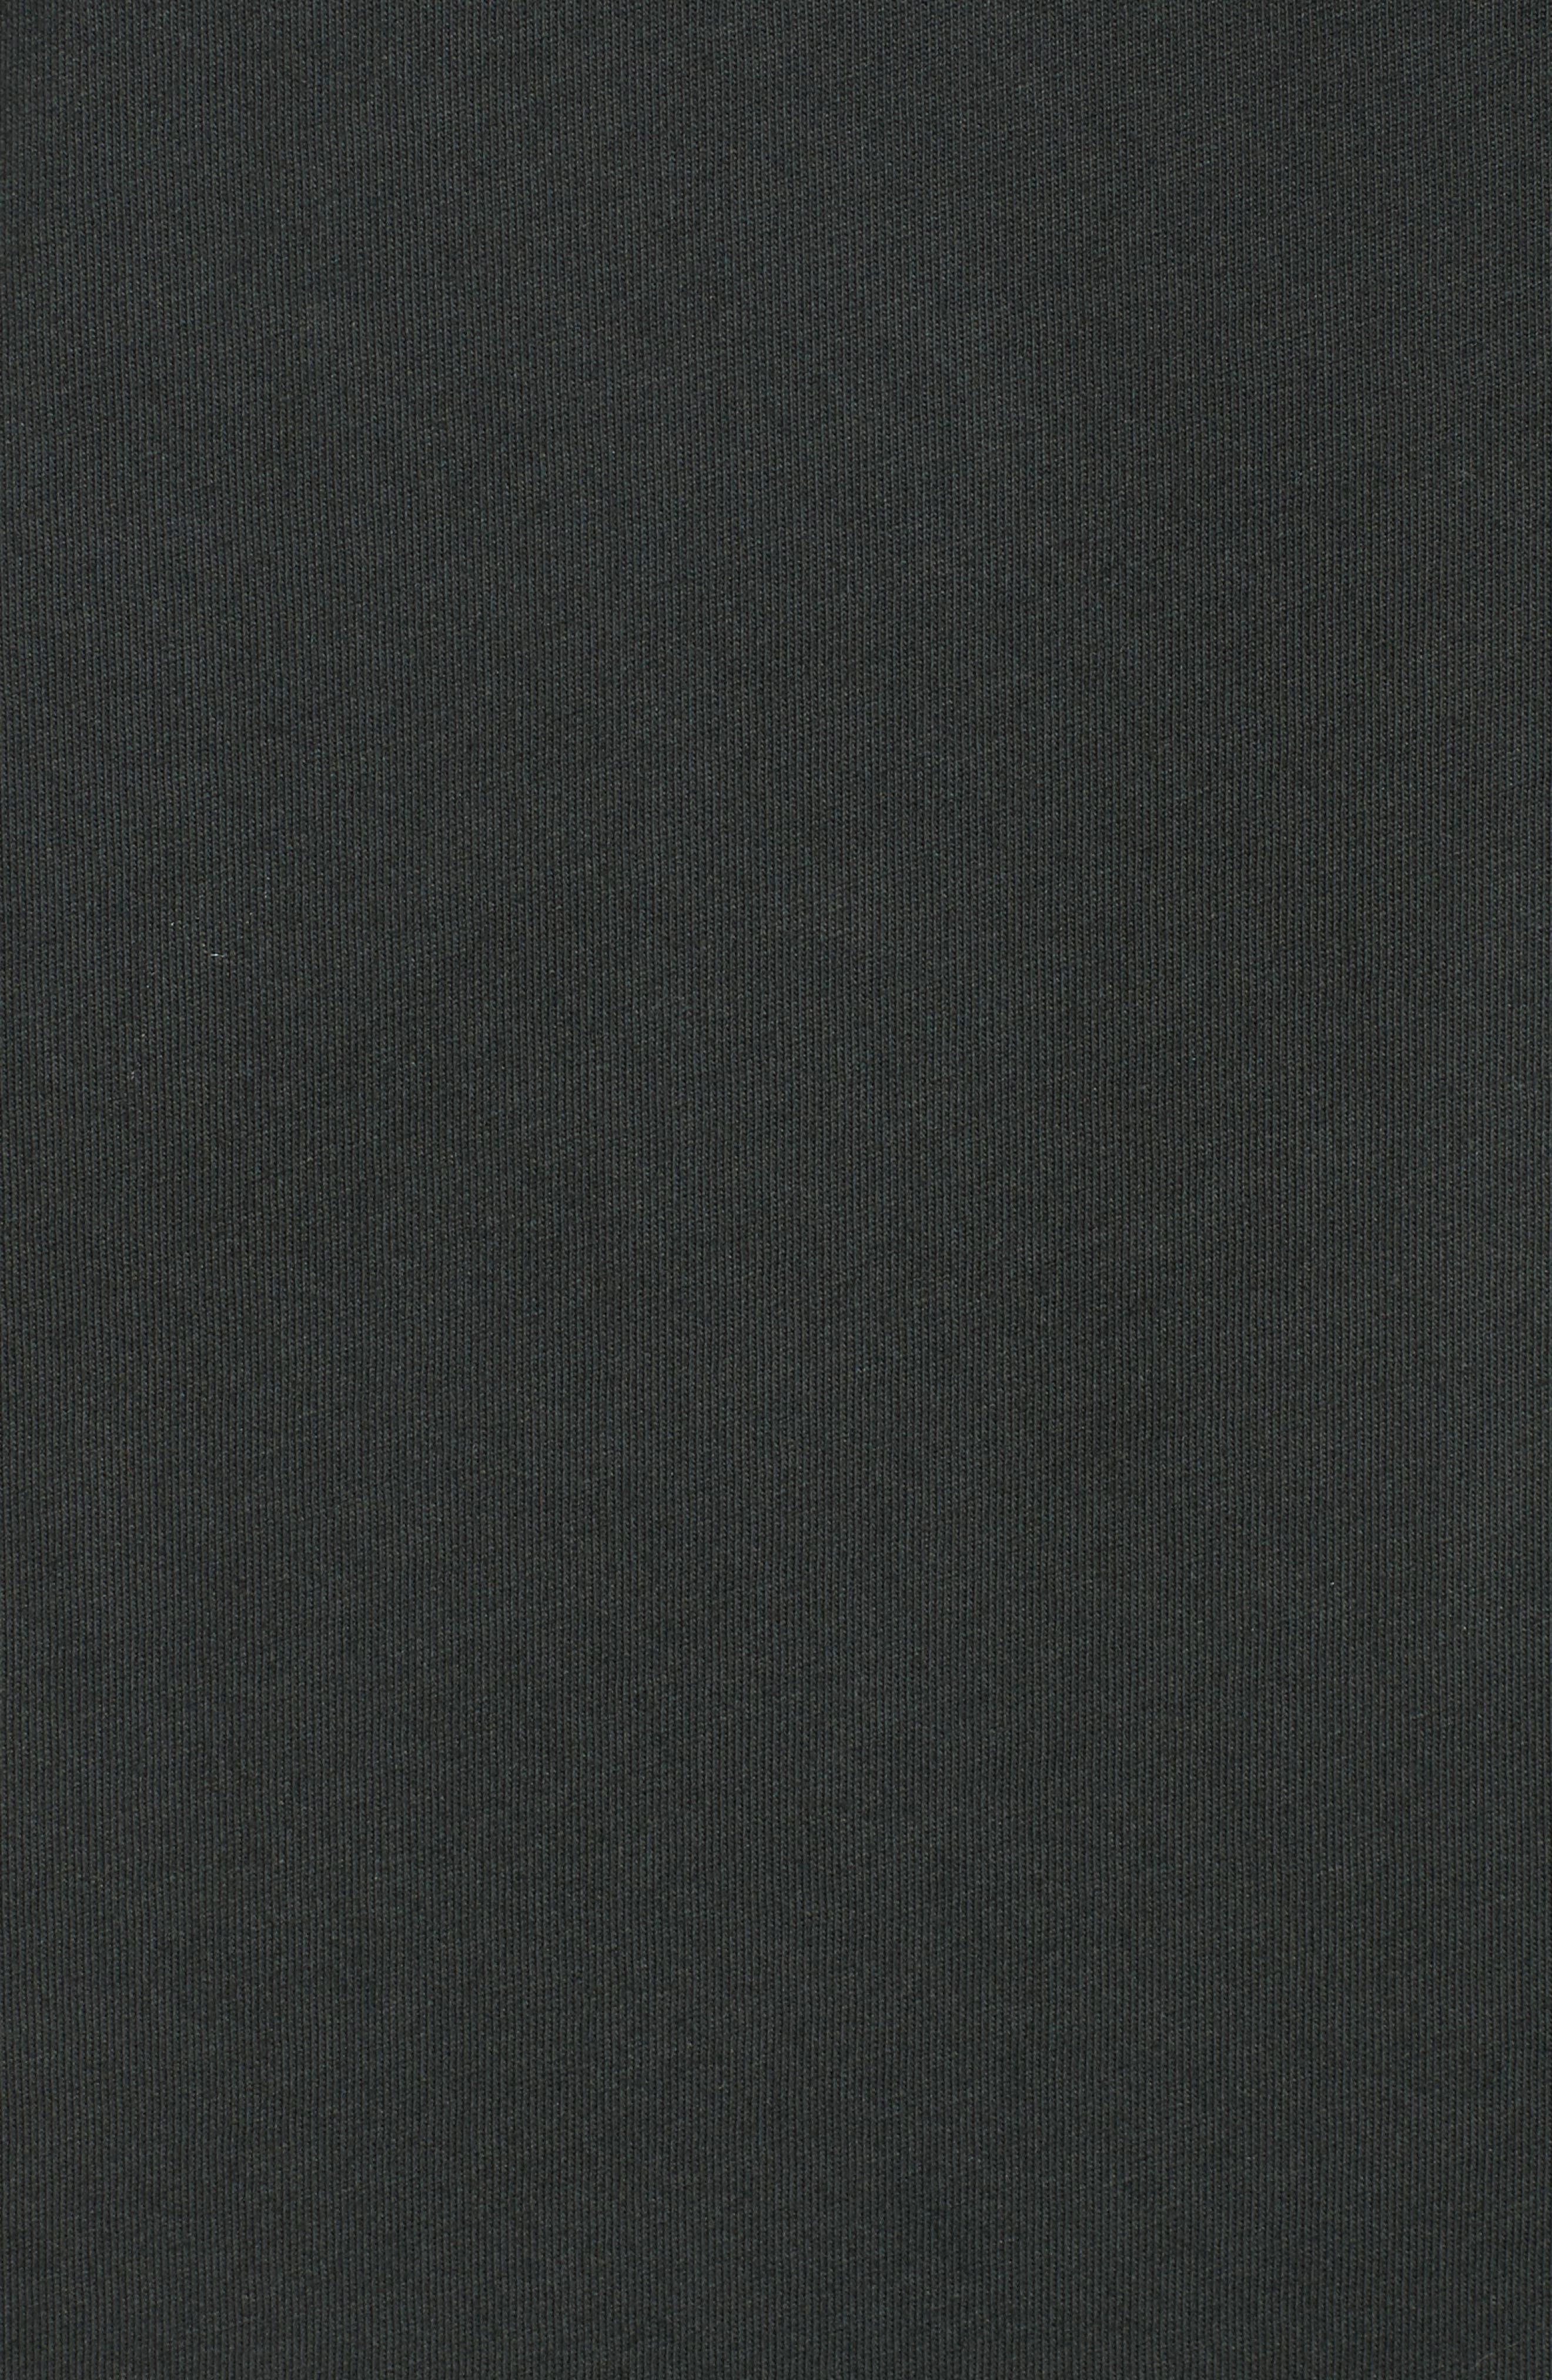 White Riot Graphic T-Shirt,                             Alternate thumbnail 5, color,                             Dusty Black